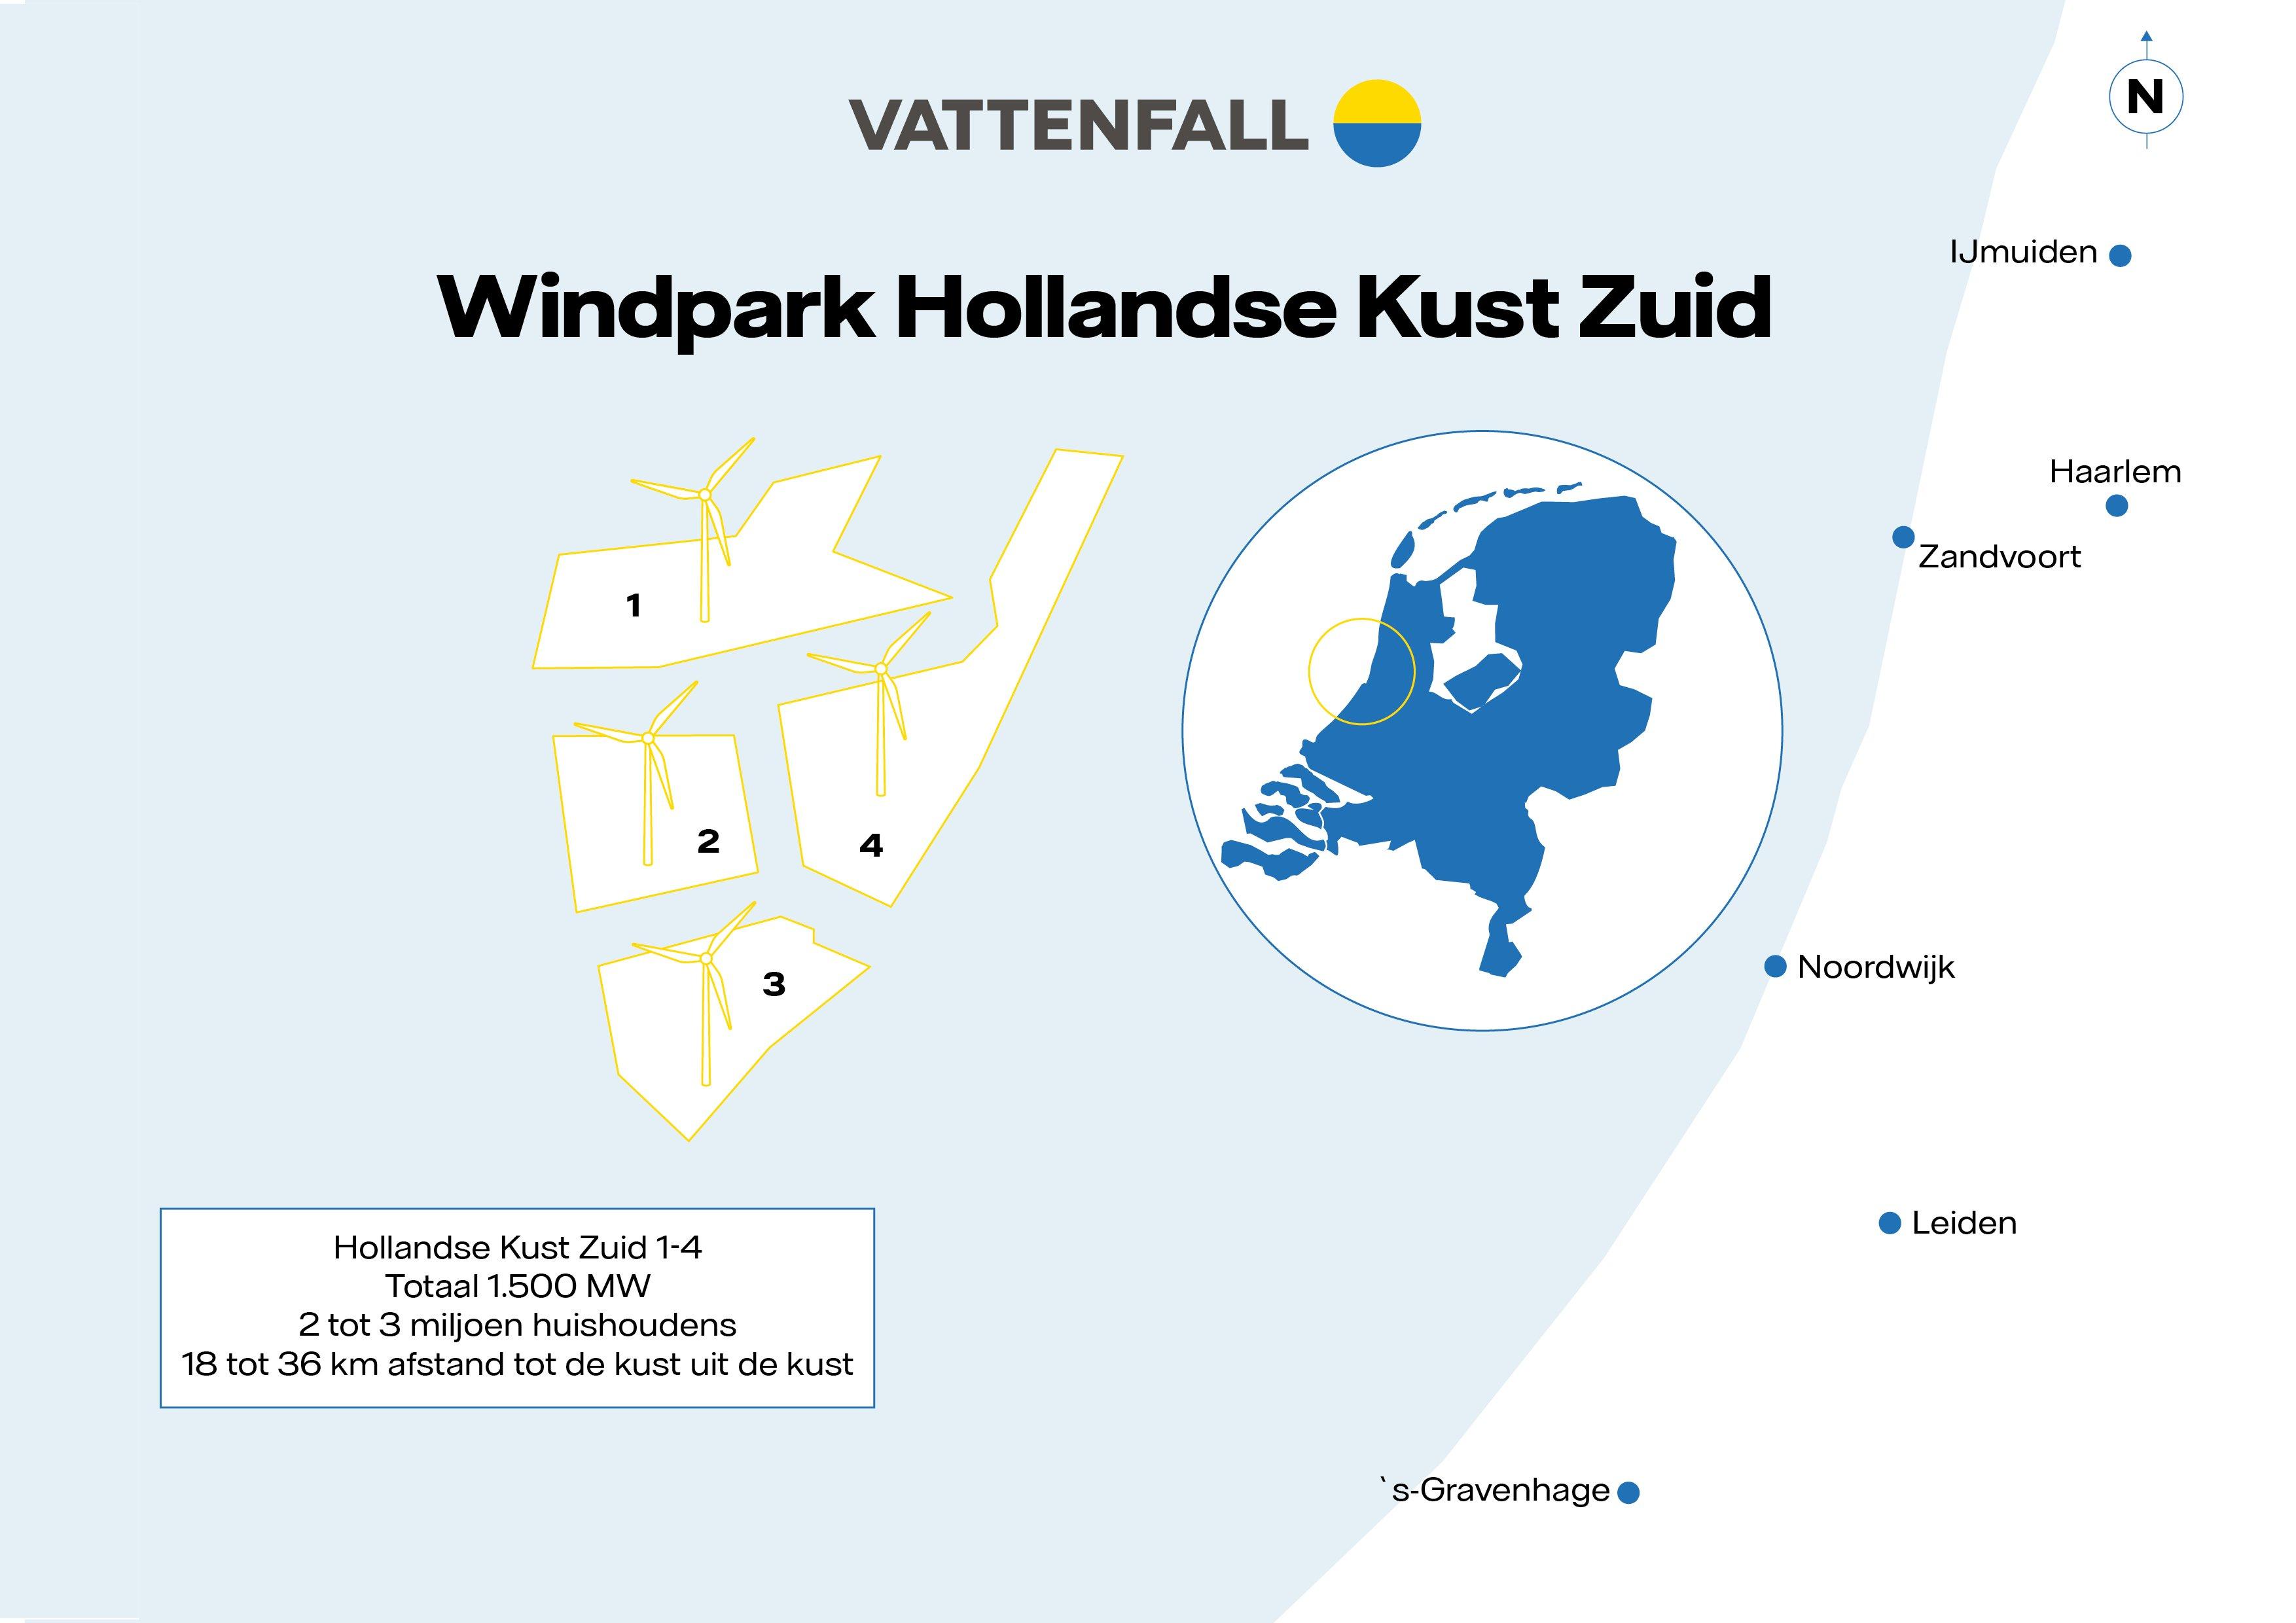 Vattenfall bouwt grootste offshore windpark ter wereld